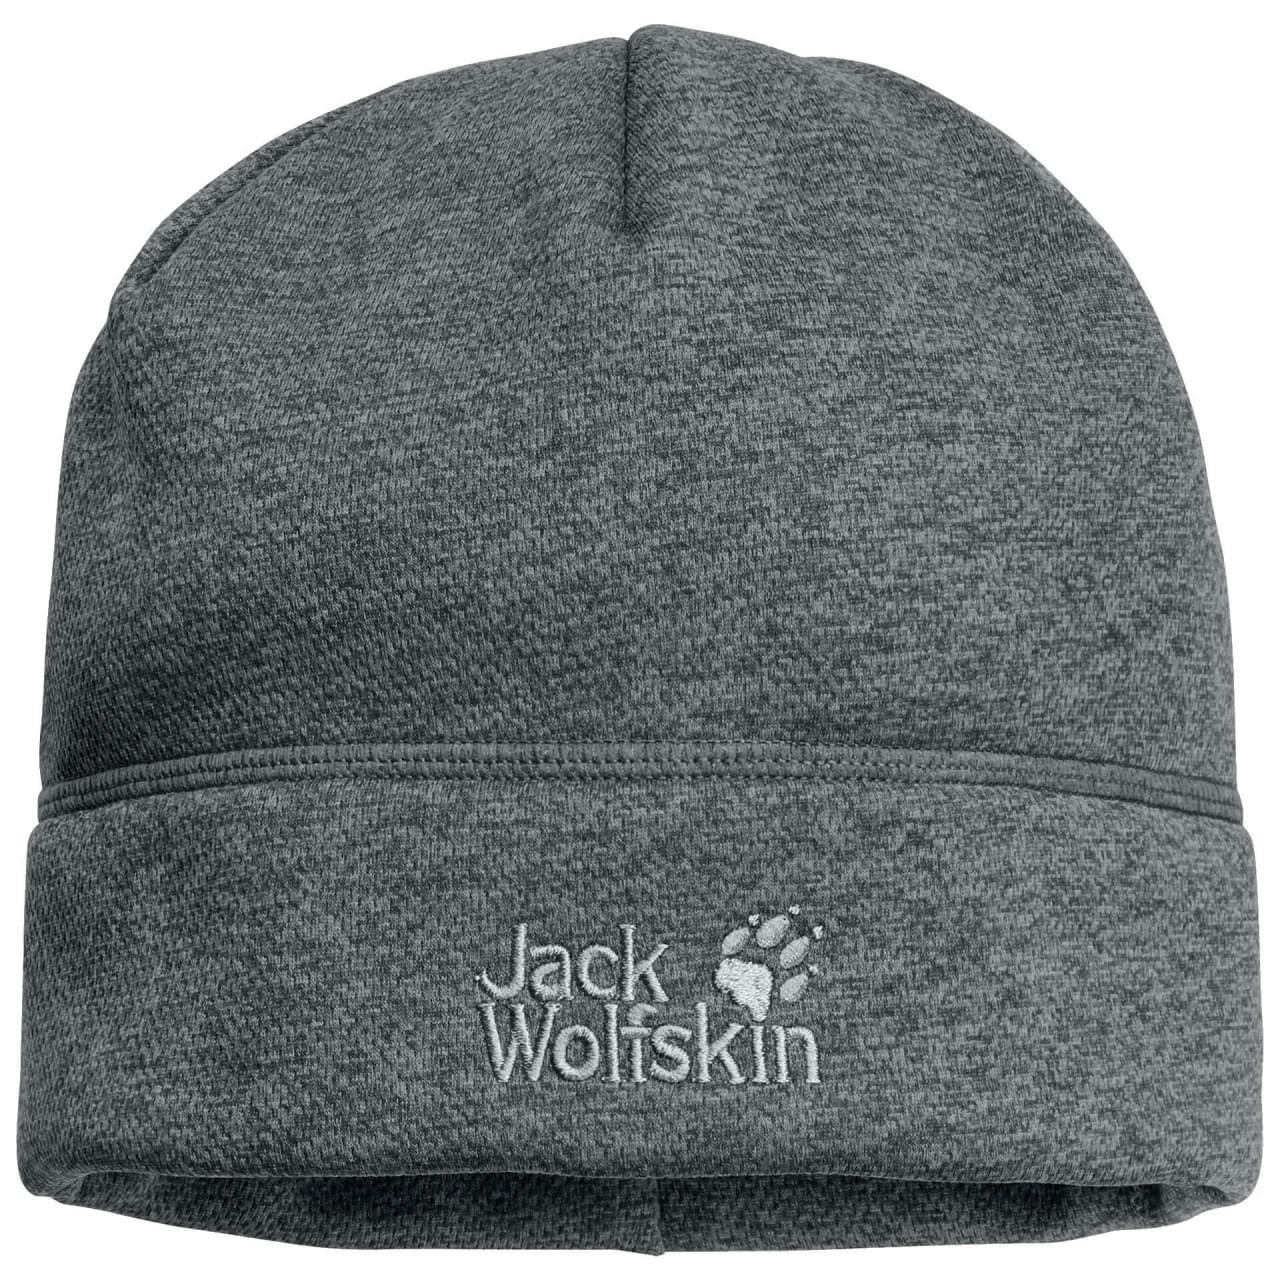 Jack Wolfskin Skyland Cap